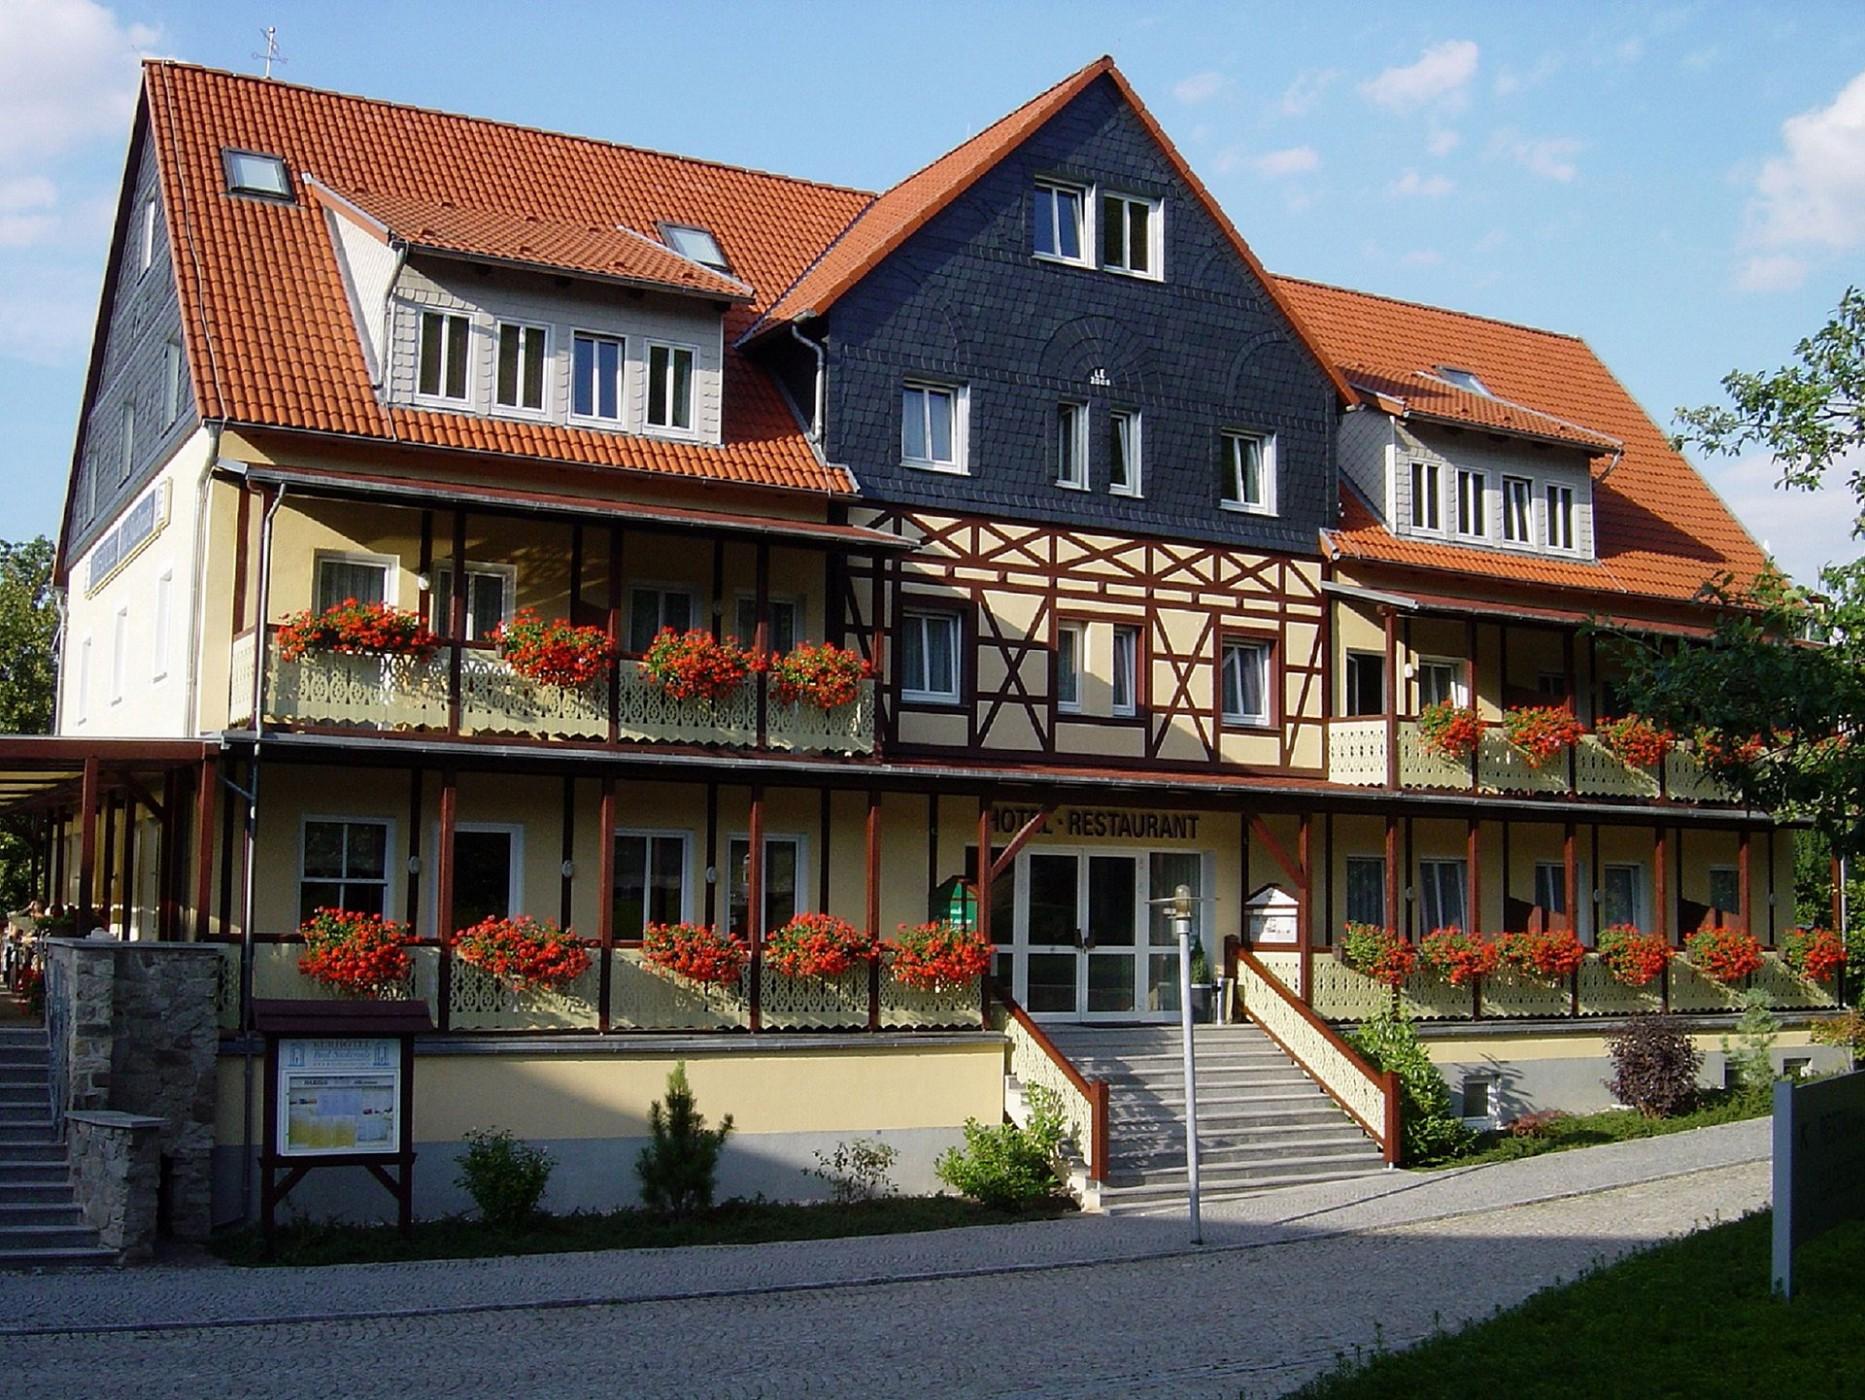 Kurhotel Bad Suderode Wellness Hotel Bei Quedlinburg